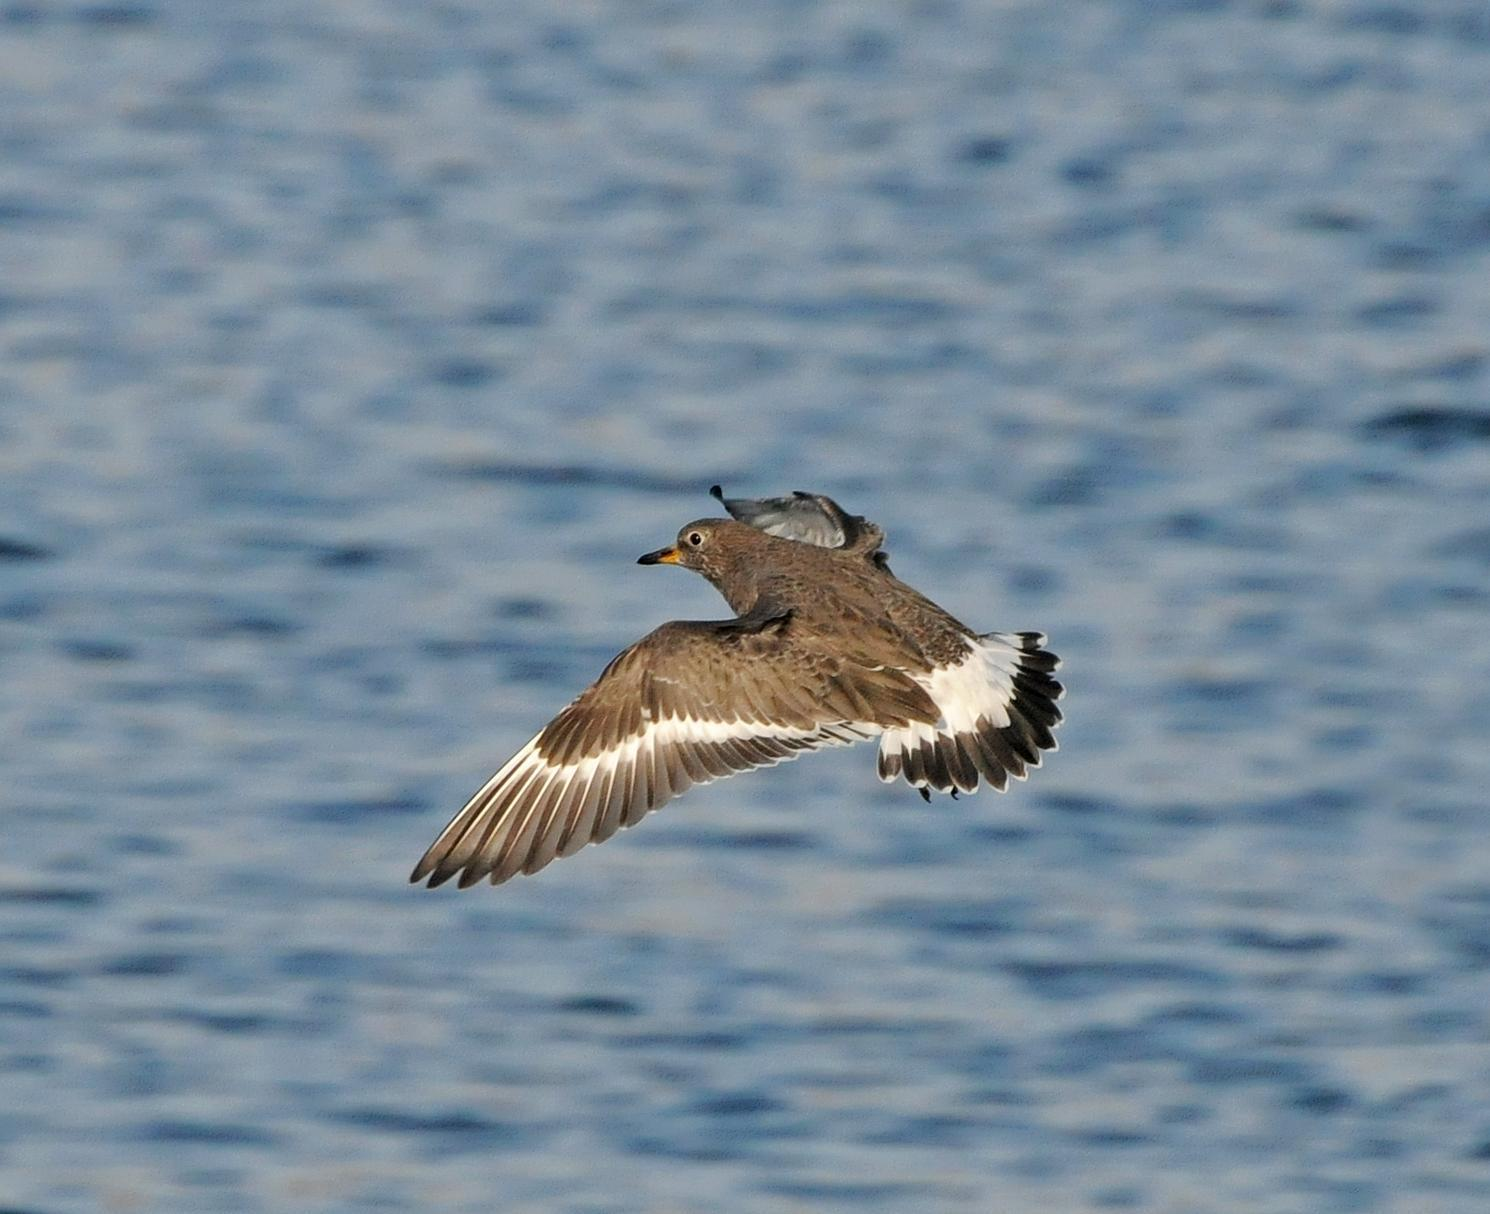 Surfbird Photo by Steven Mlodinow